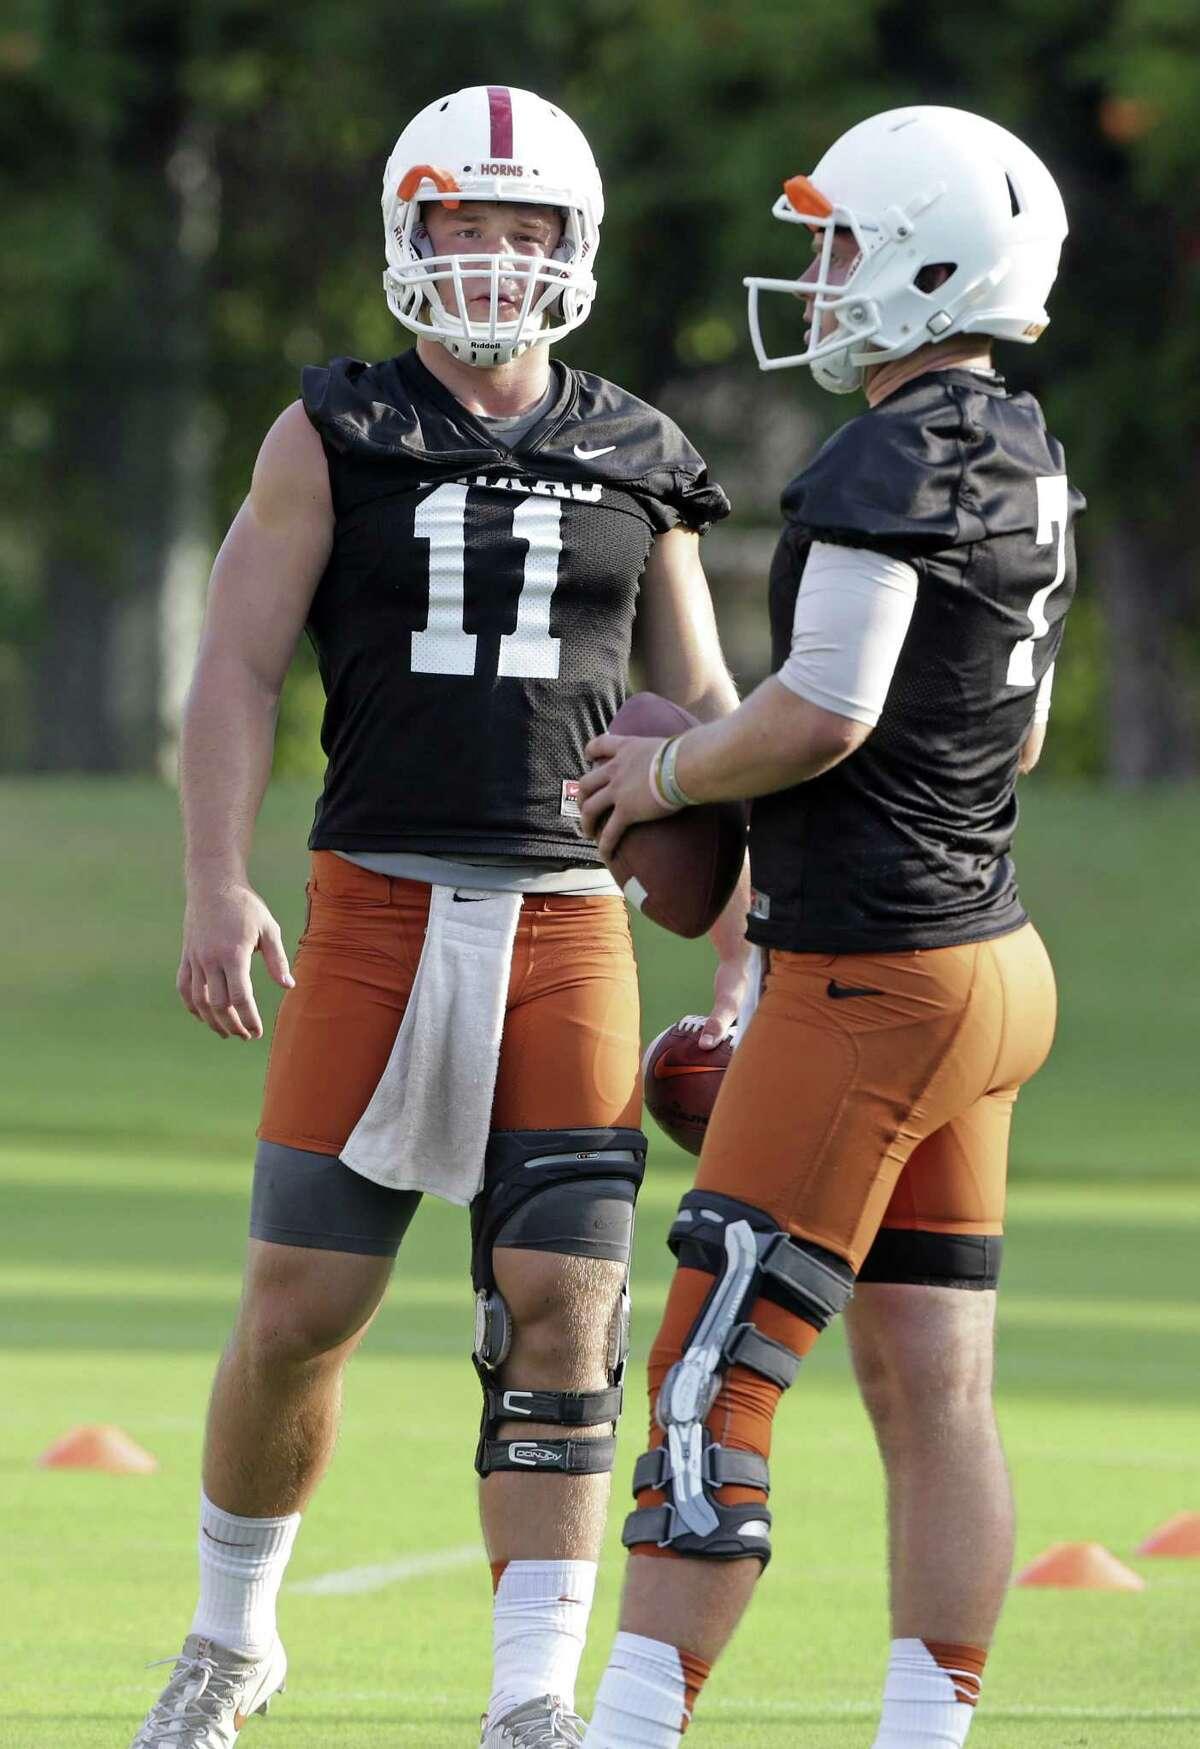 Quarterbacks Sam Ehlinger (left) and Shane Buechele hang together in drills during UT football practice at Frank Denius Fields in Austin on July 31, 2017.